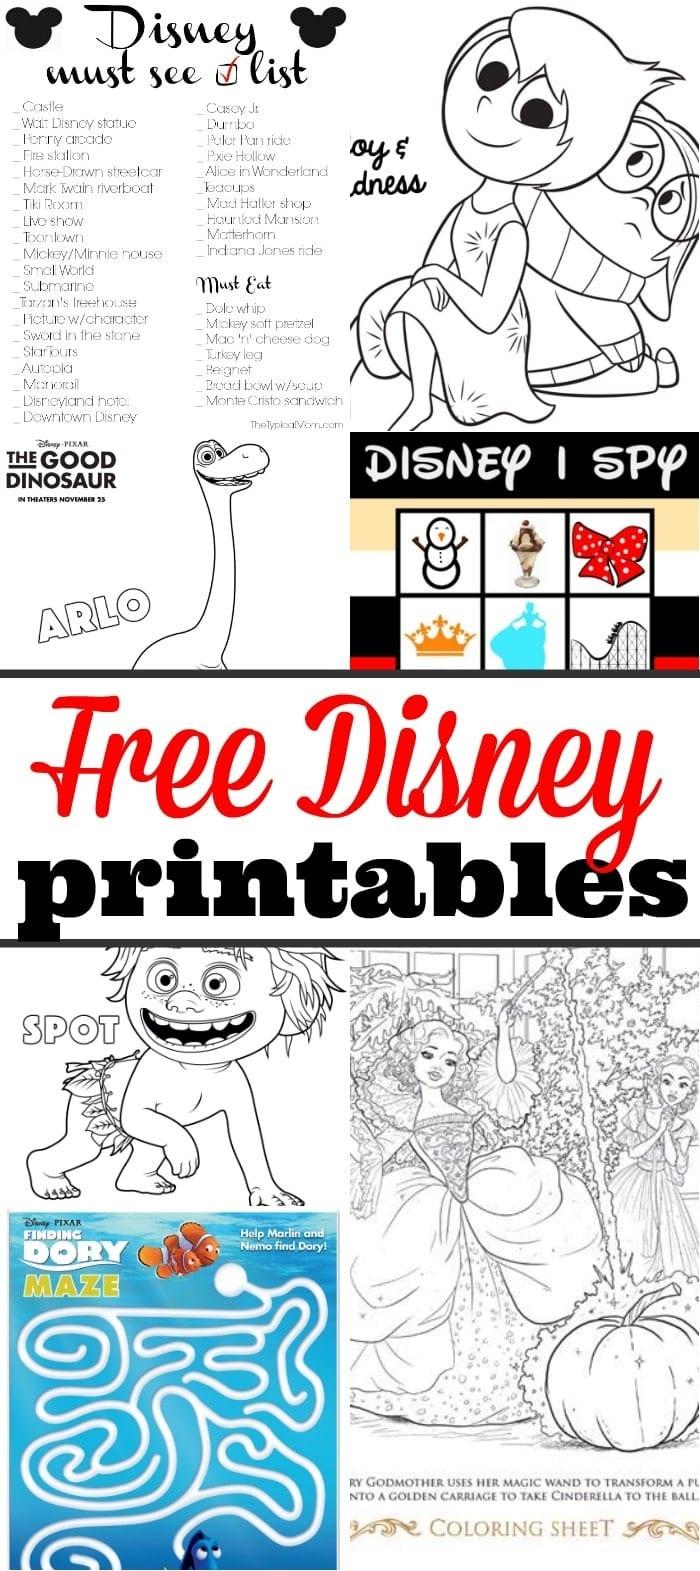 Disney Printables · The Typical Mom - Free Disney Printables